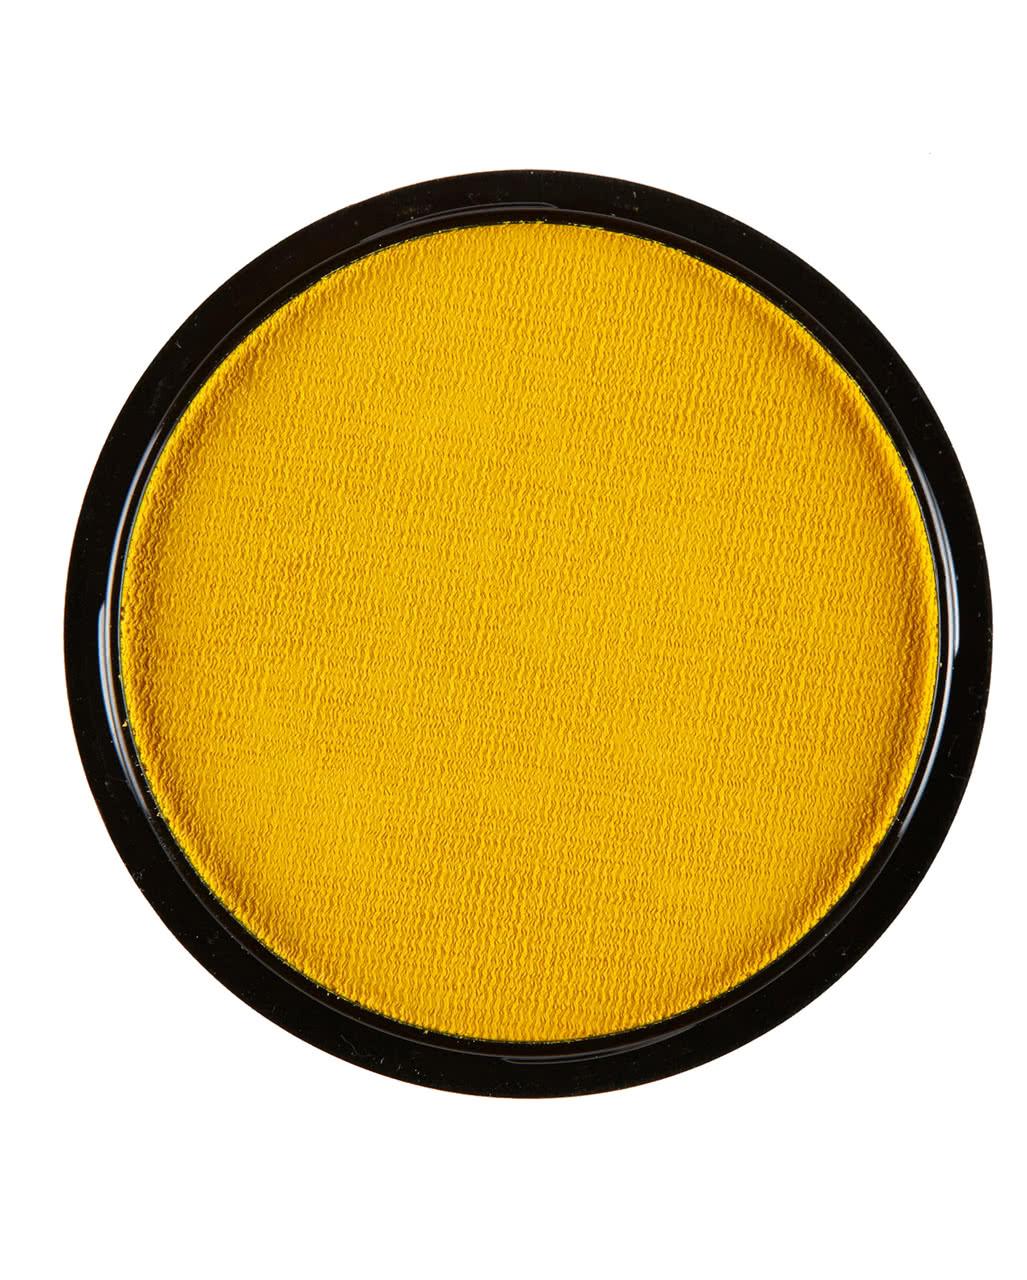 aqua make up yellow buy theater make up horror. Black Bedroom Furniture Sets. Home Design Ideas